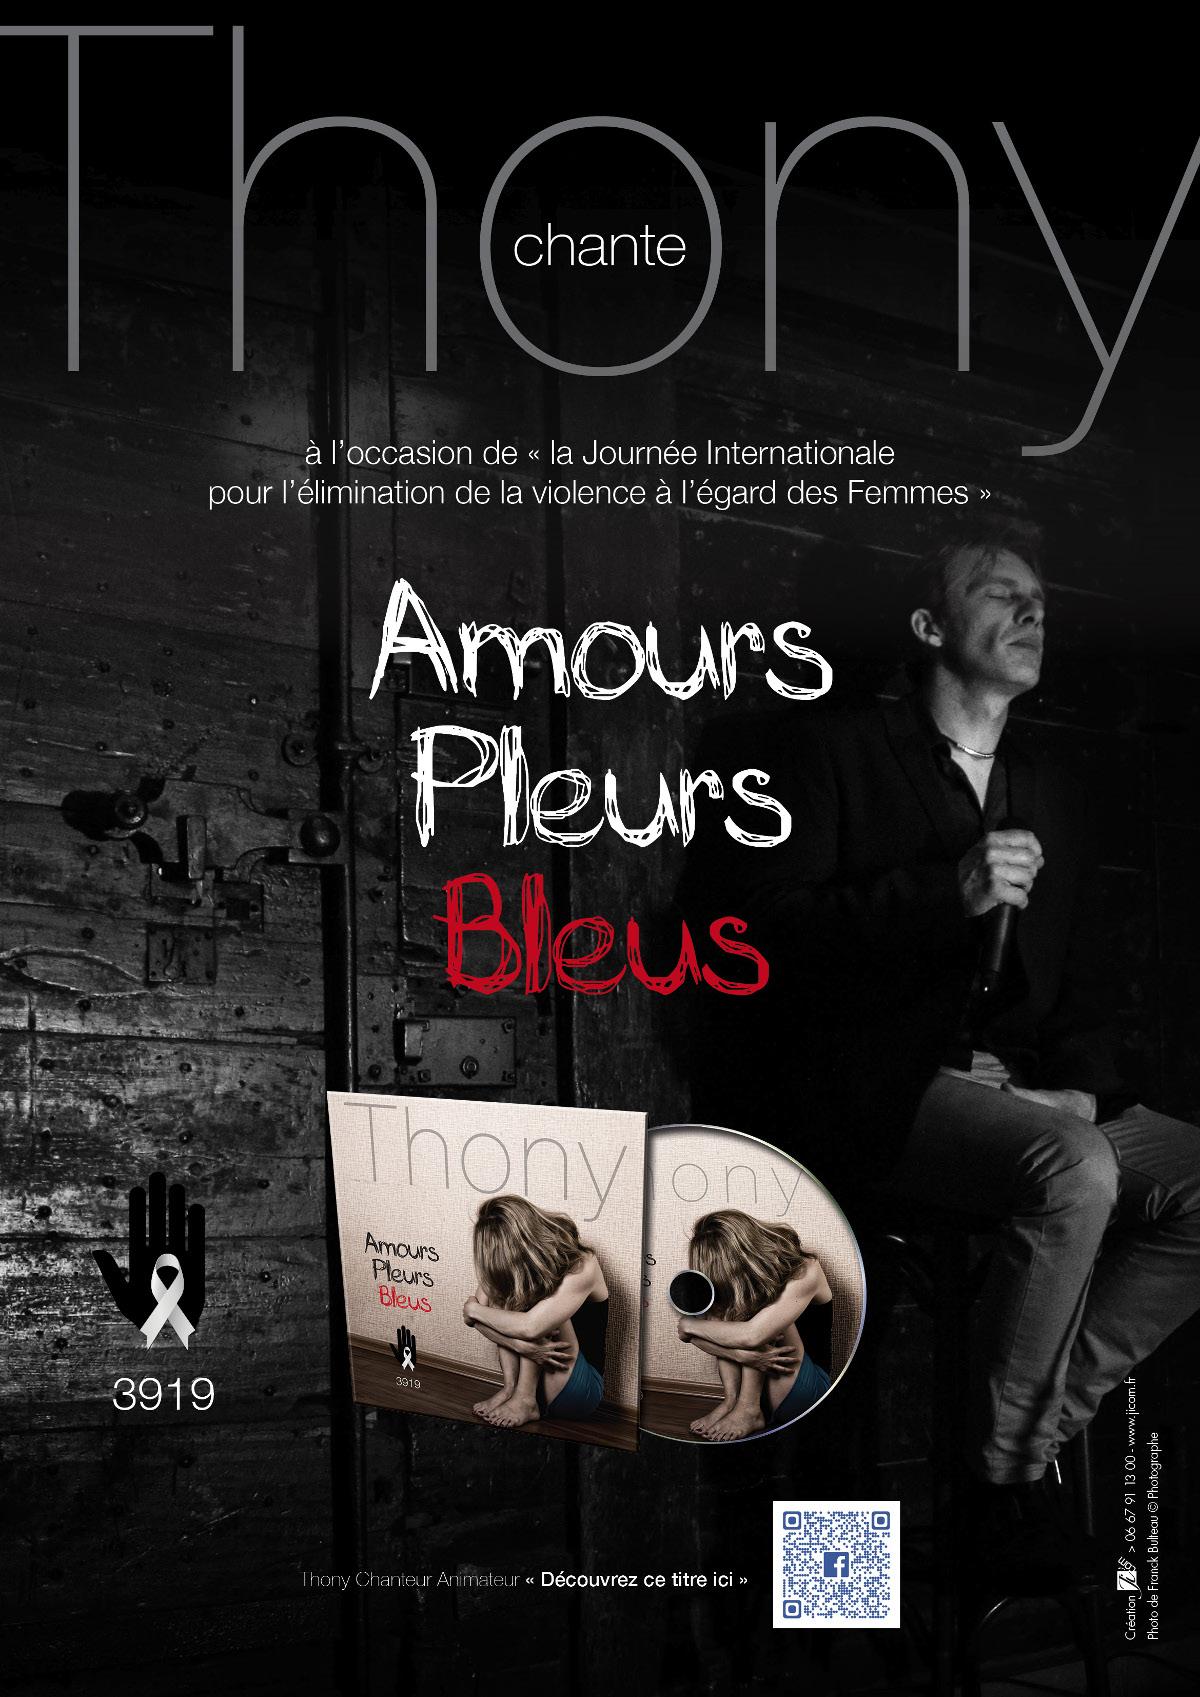 amours pleurs bleus film 2016 allocin. Black Bedroom Furniture Sets. Home Design Ideas